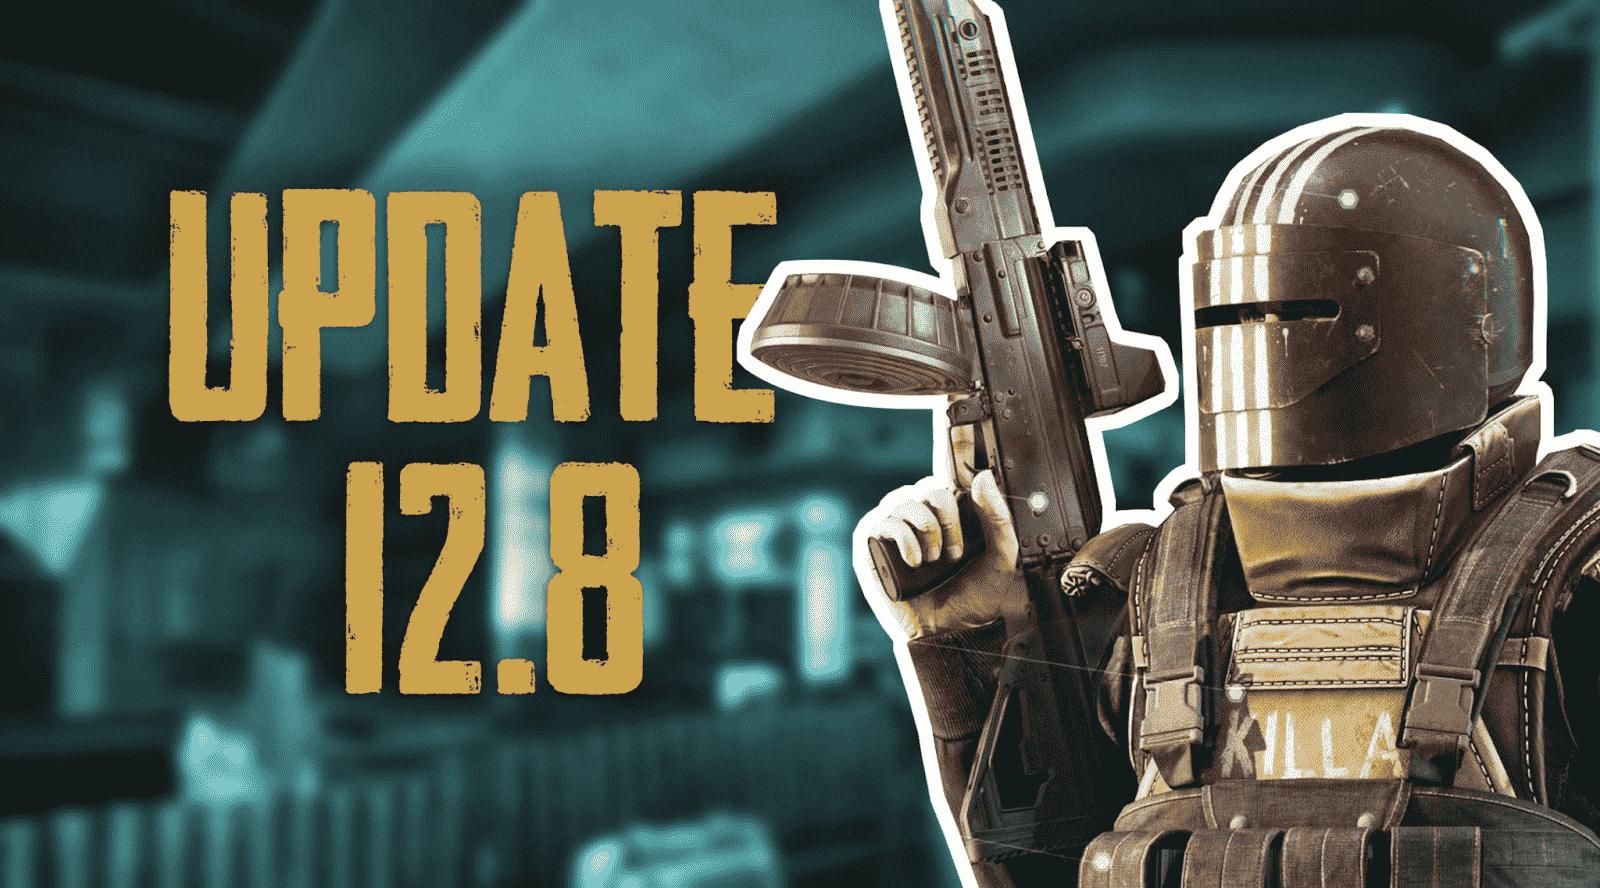 The updates